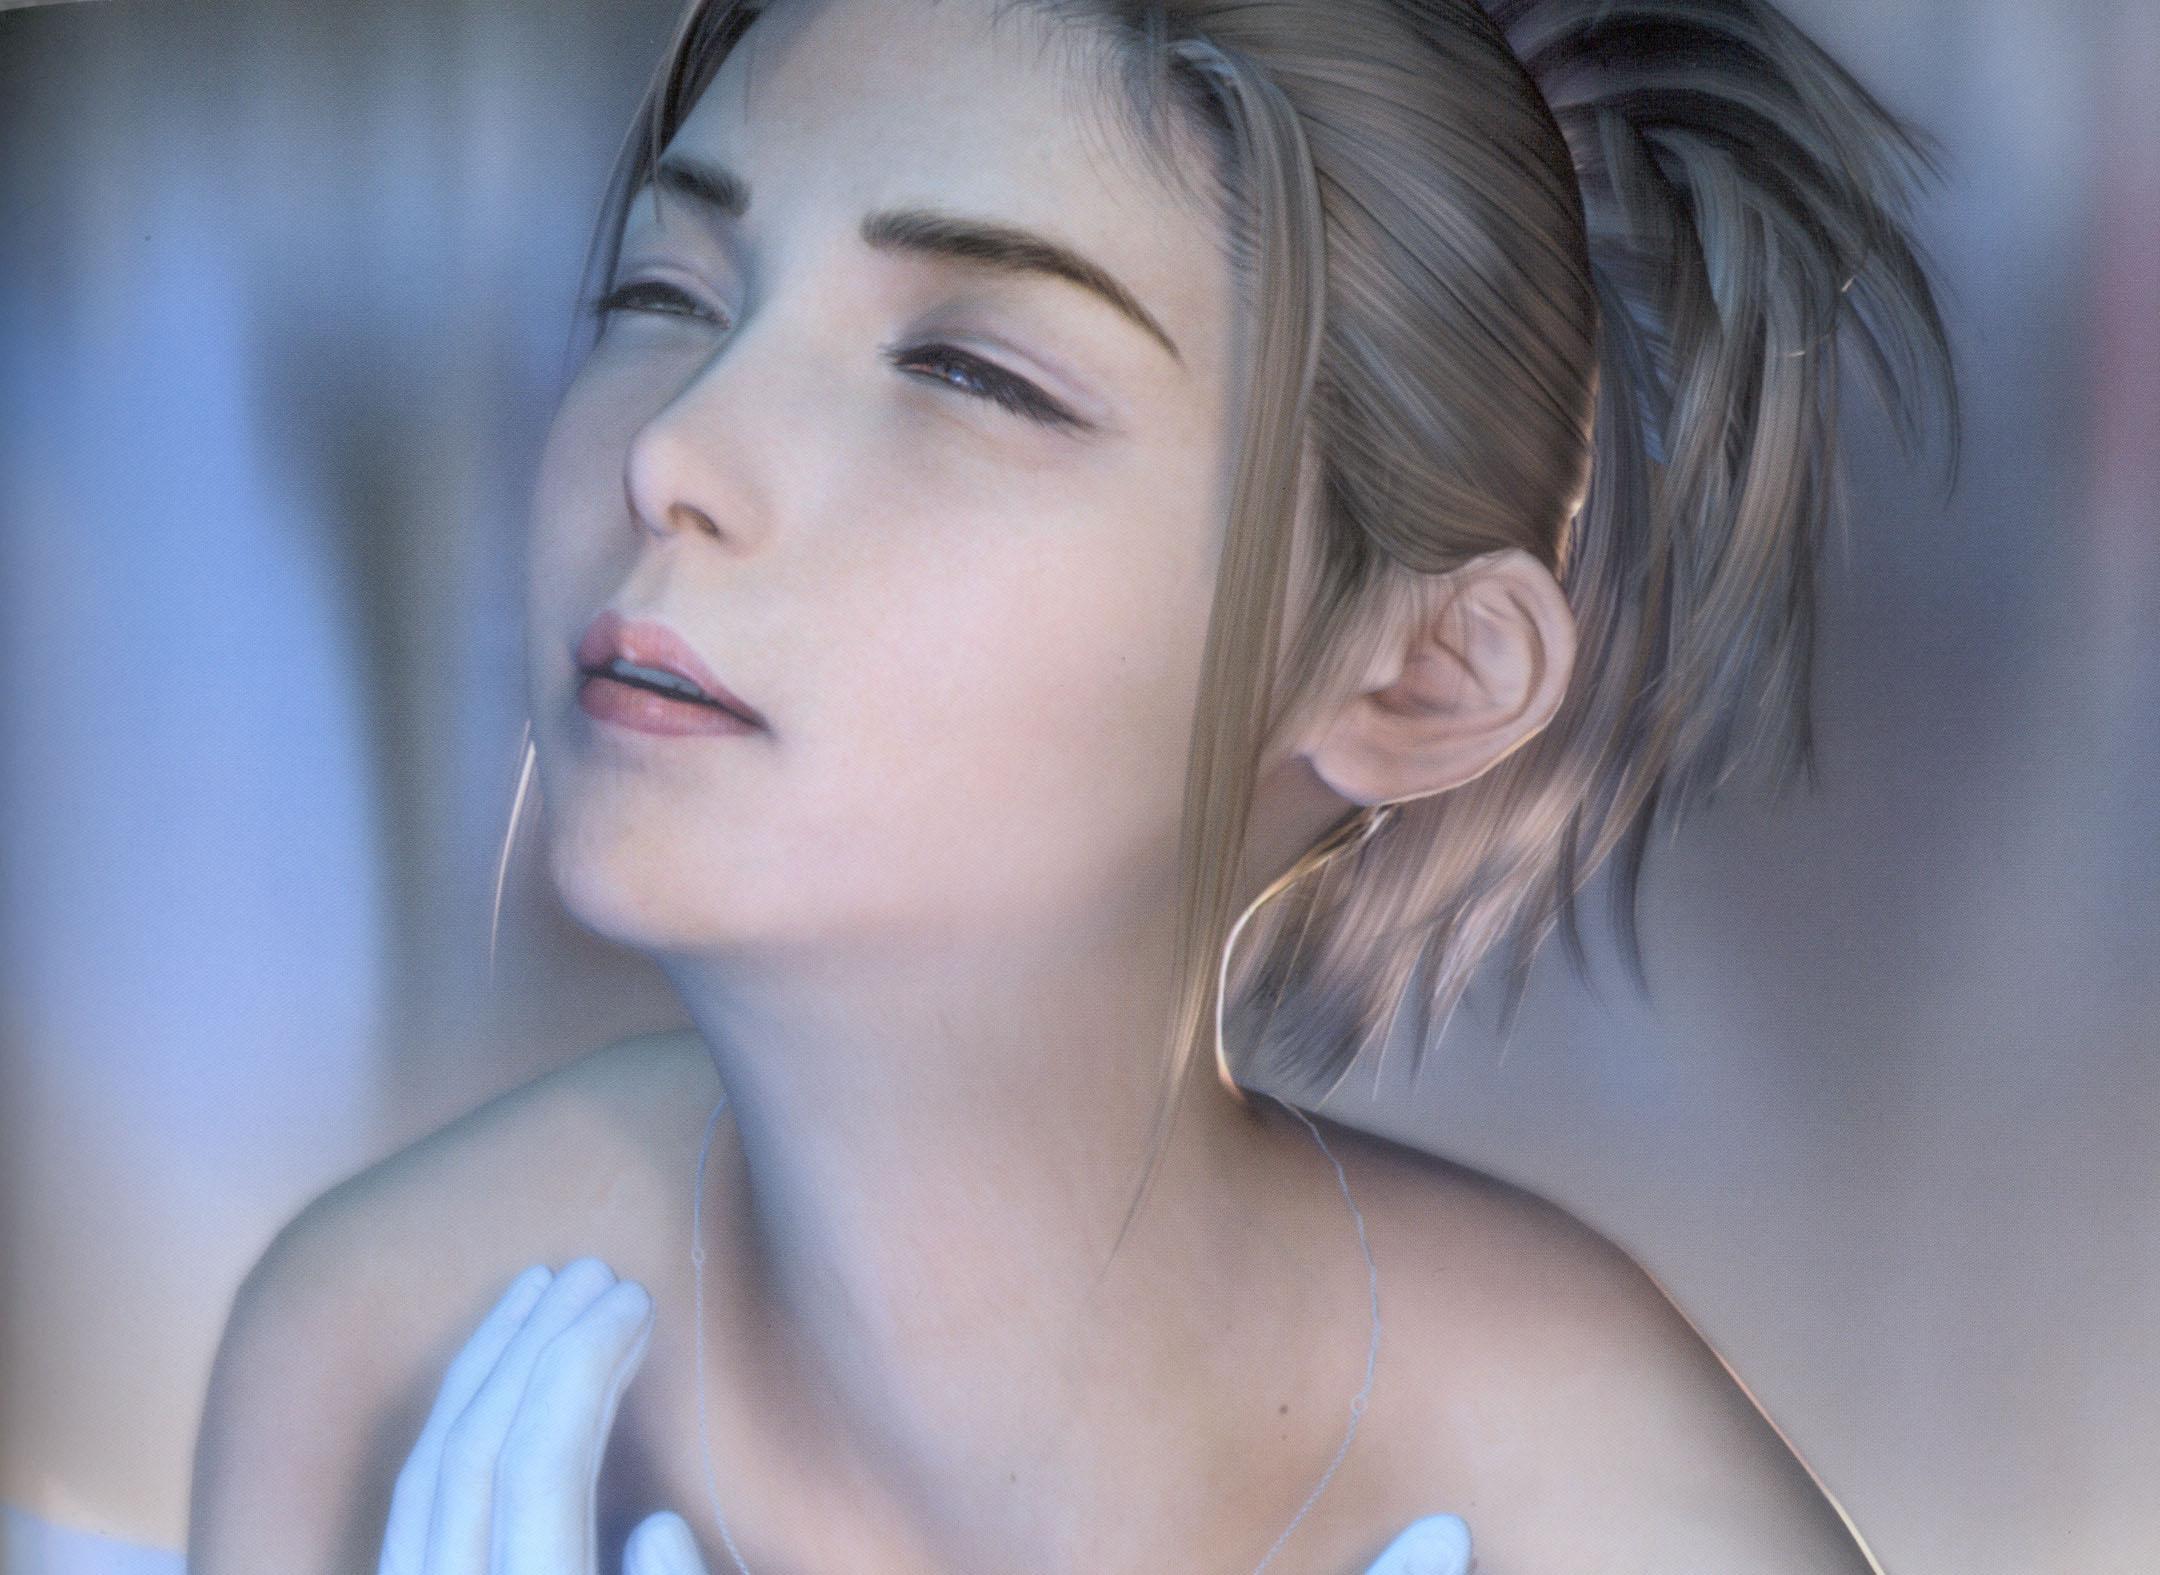 Yuna - Final Fantasy X | page 5 of 13 - Zerochan Anime